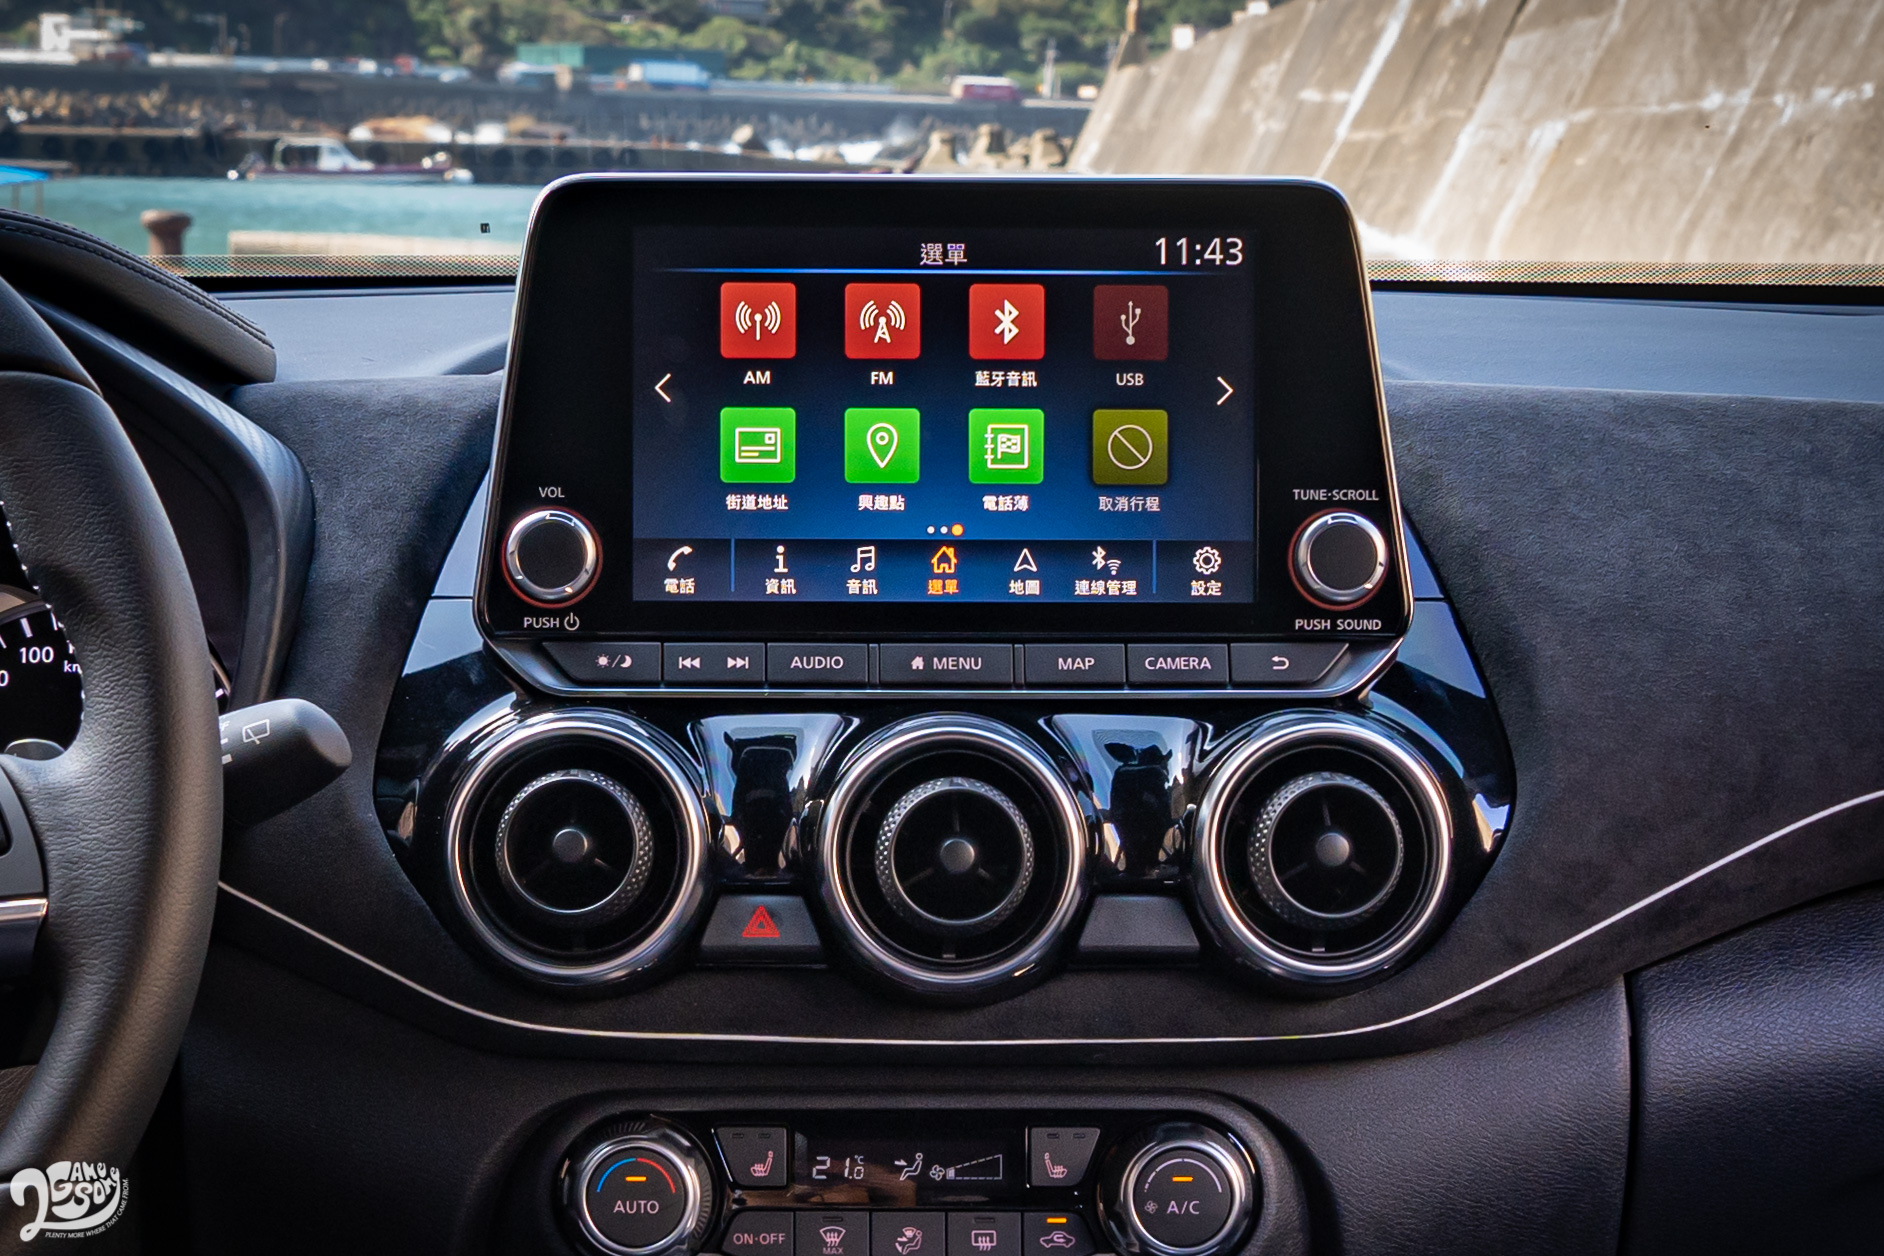 Apple CarPlay、Android Auto 等手機整合系統盡是標配,8 吋中央觸控螢幕操作也算直覺;若是中階和頂規版本,也擁有畫質還可接受的環景影像監控系統。